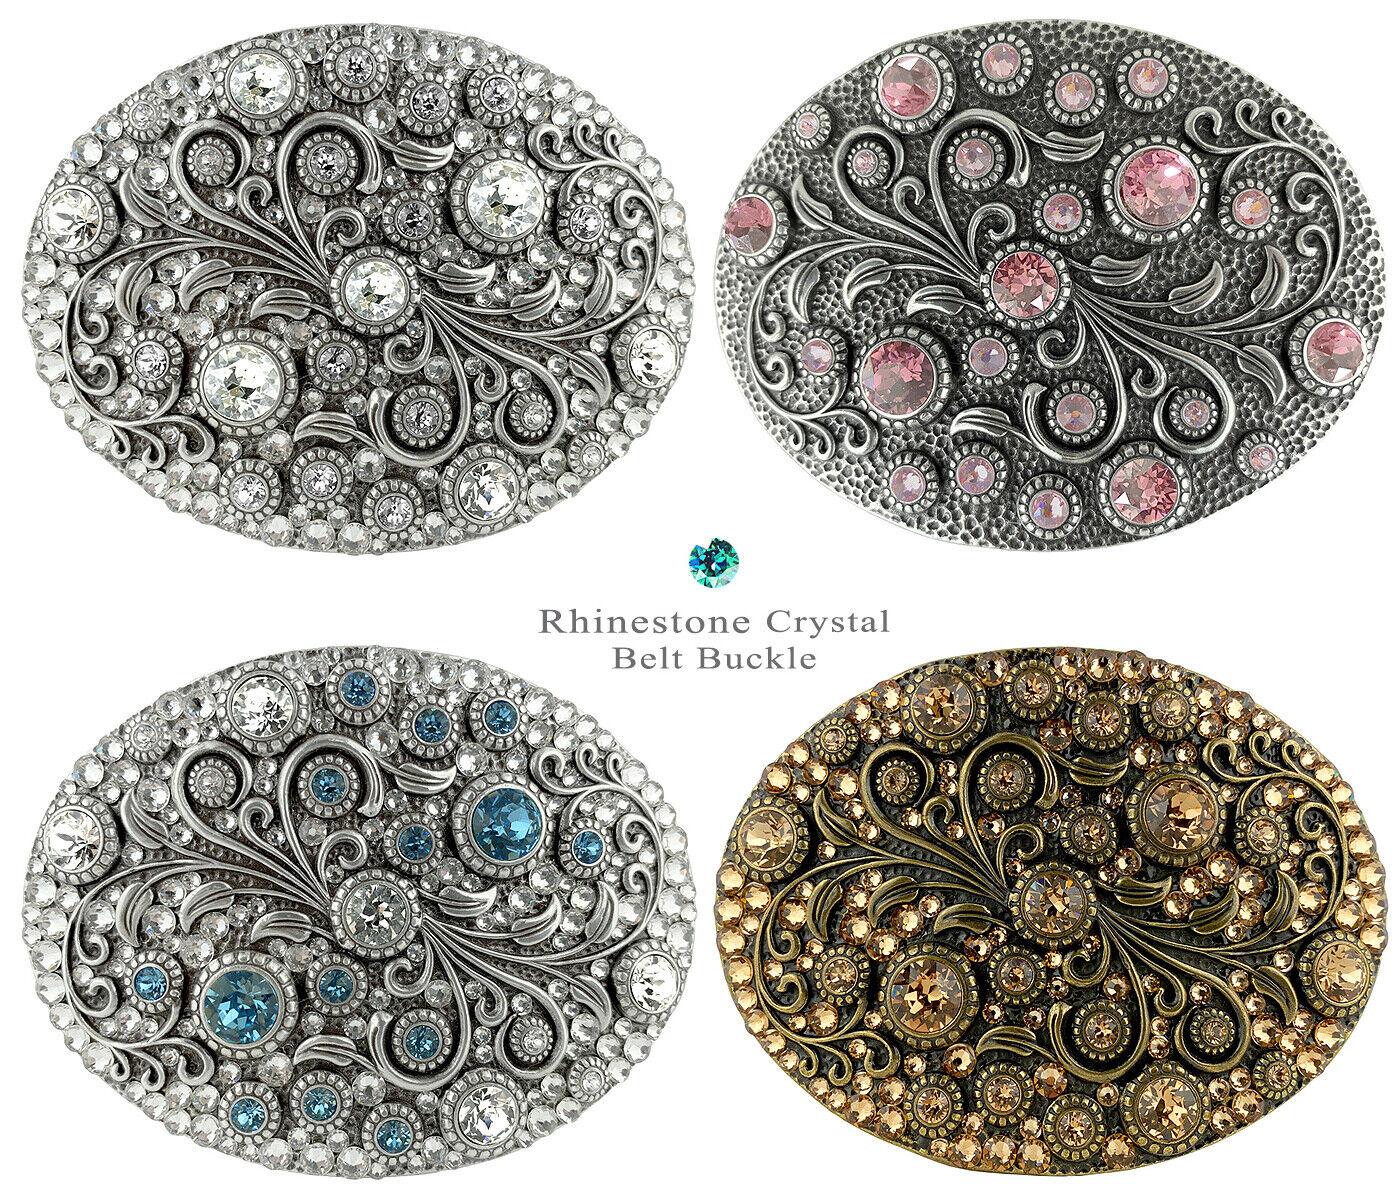 Rhinestone Crystal Belt Buckle Oval Floral Engraved Buckle Fits 1-1/2